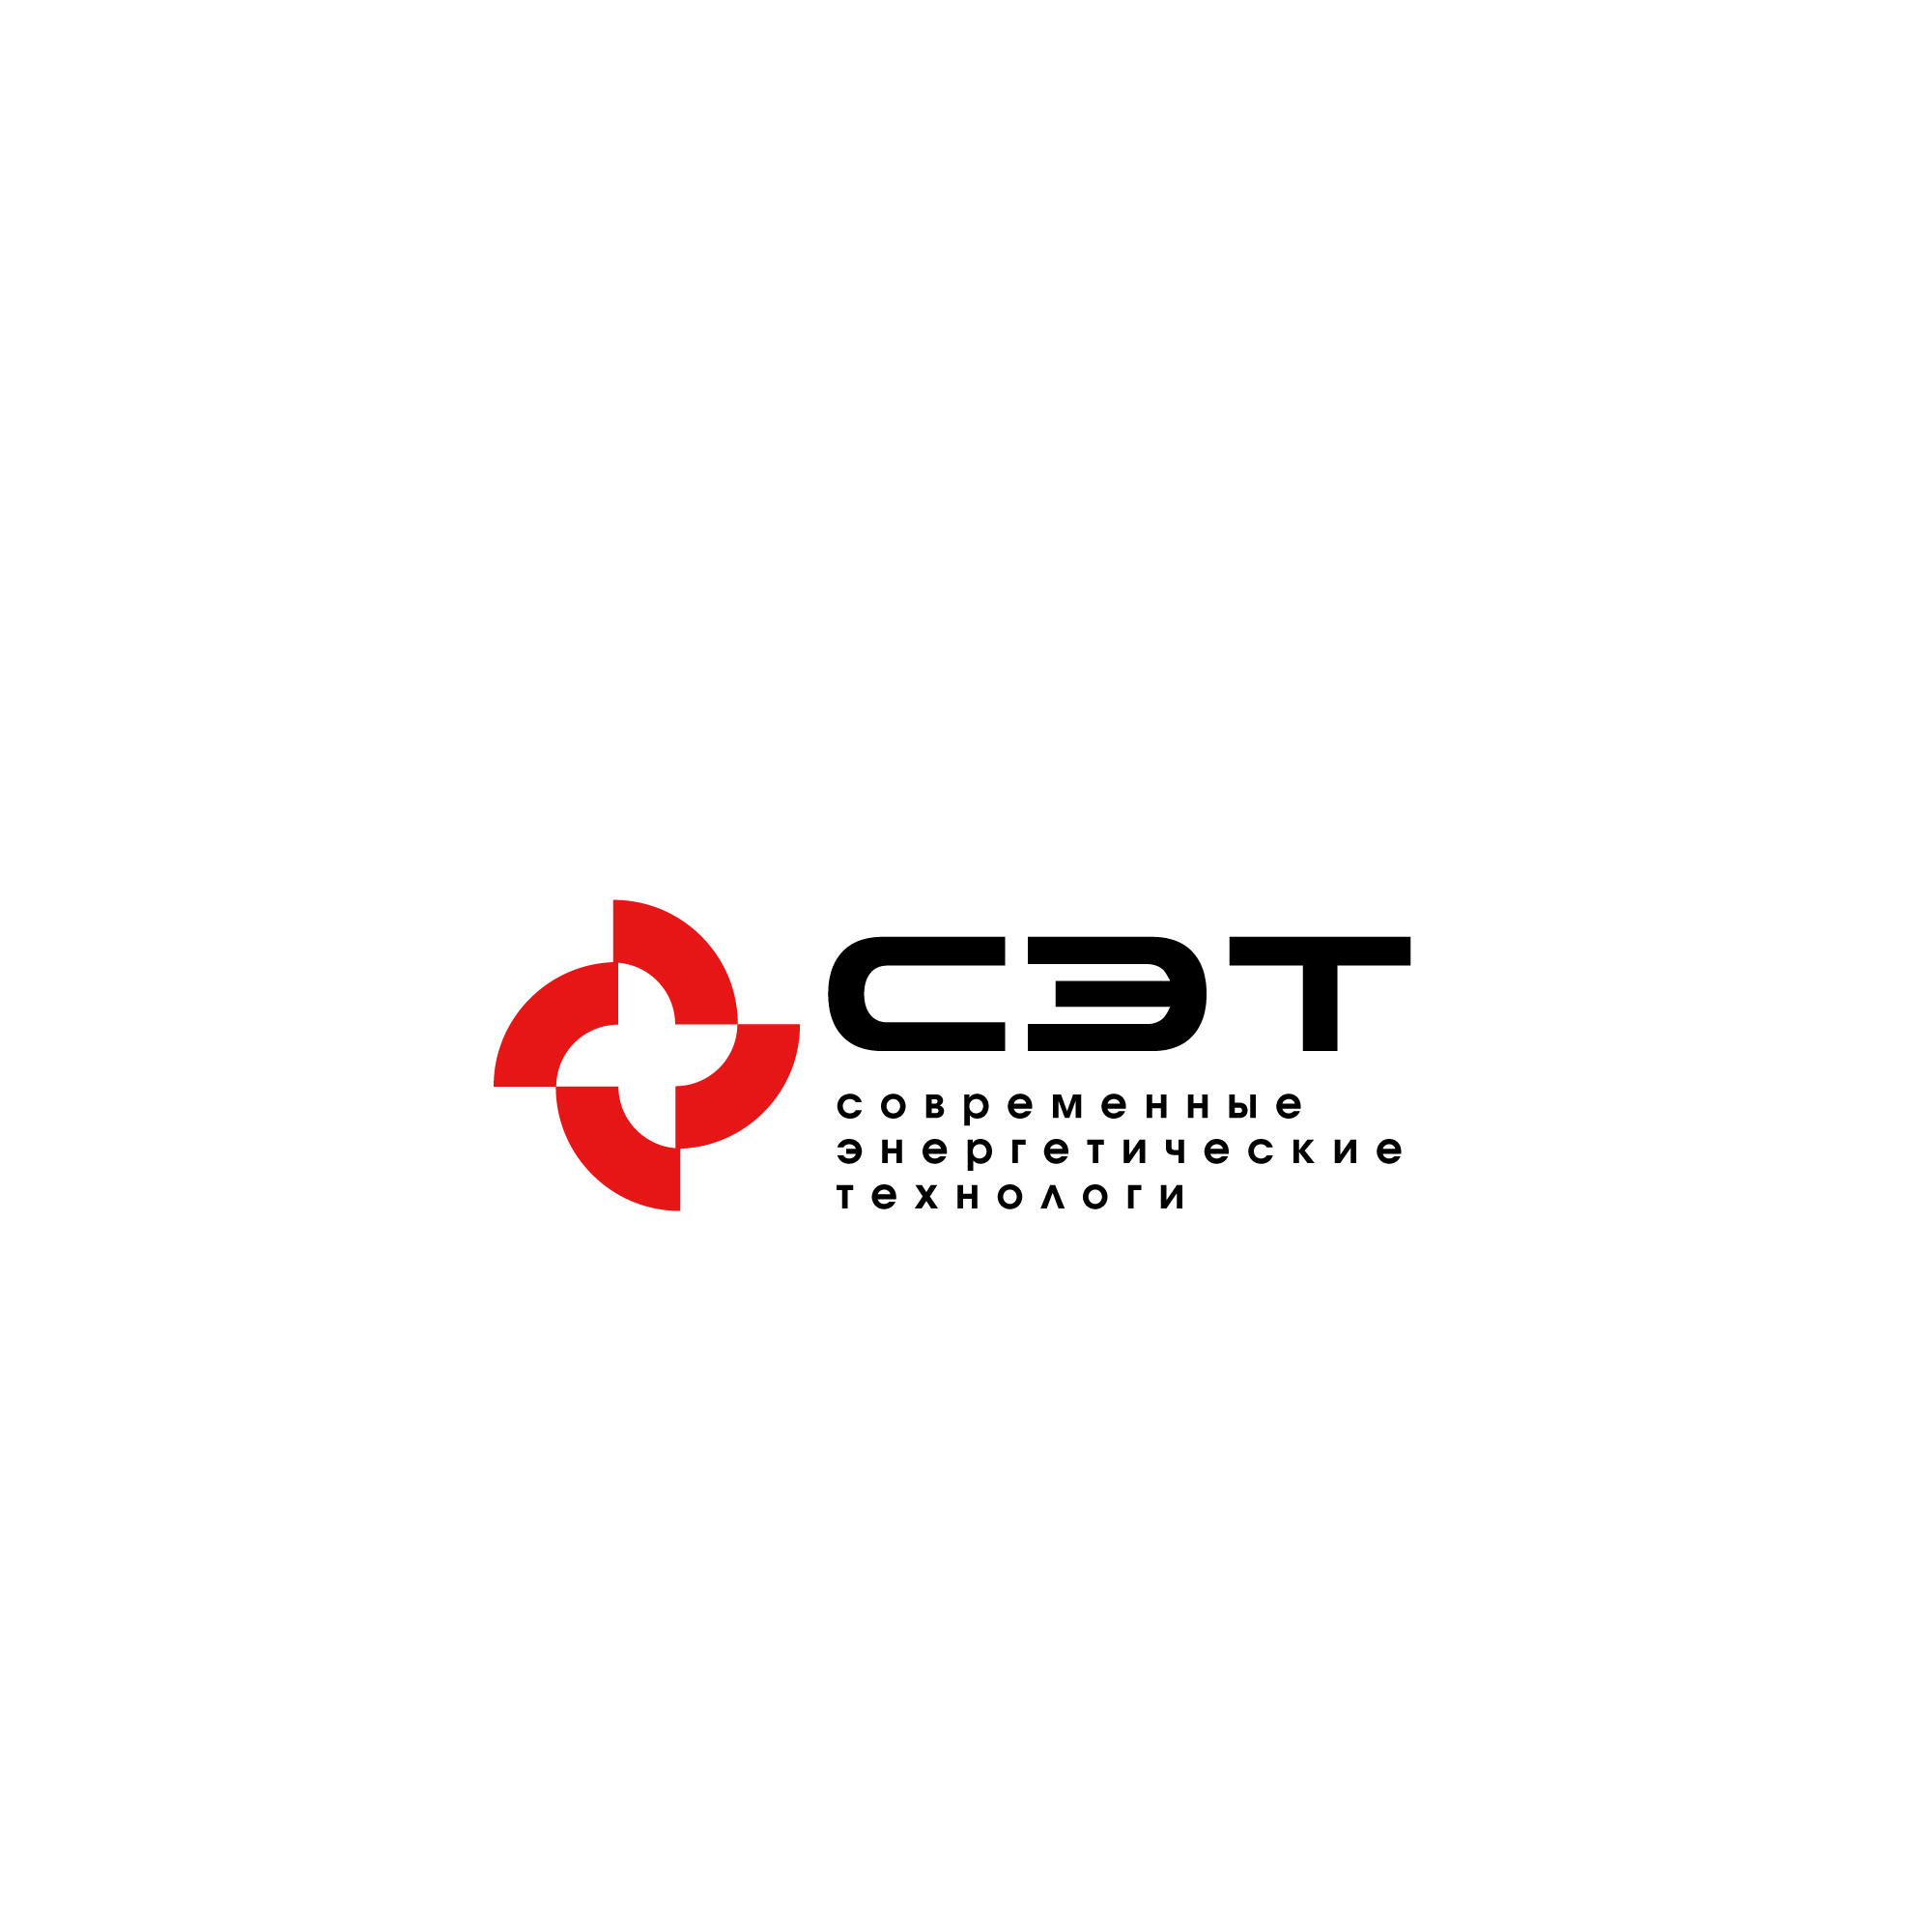 Срочно! Дизайн логотипа ООО «СЭТ» фото f_5885d4b2593e47ba.jpg